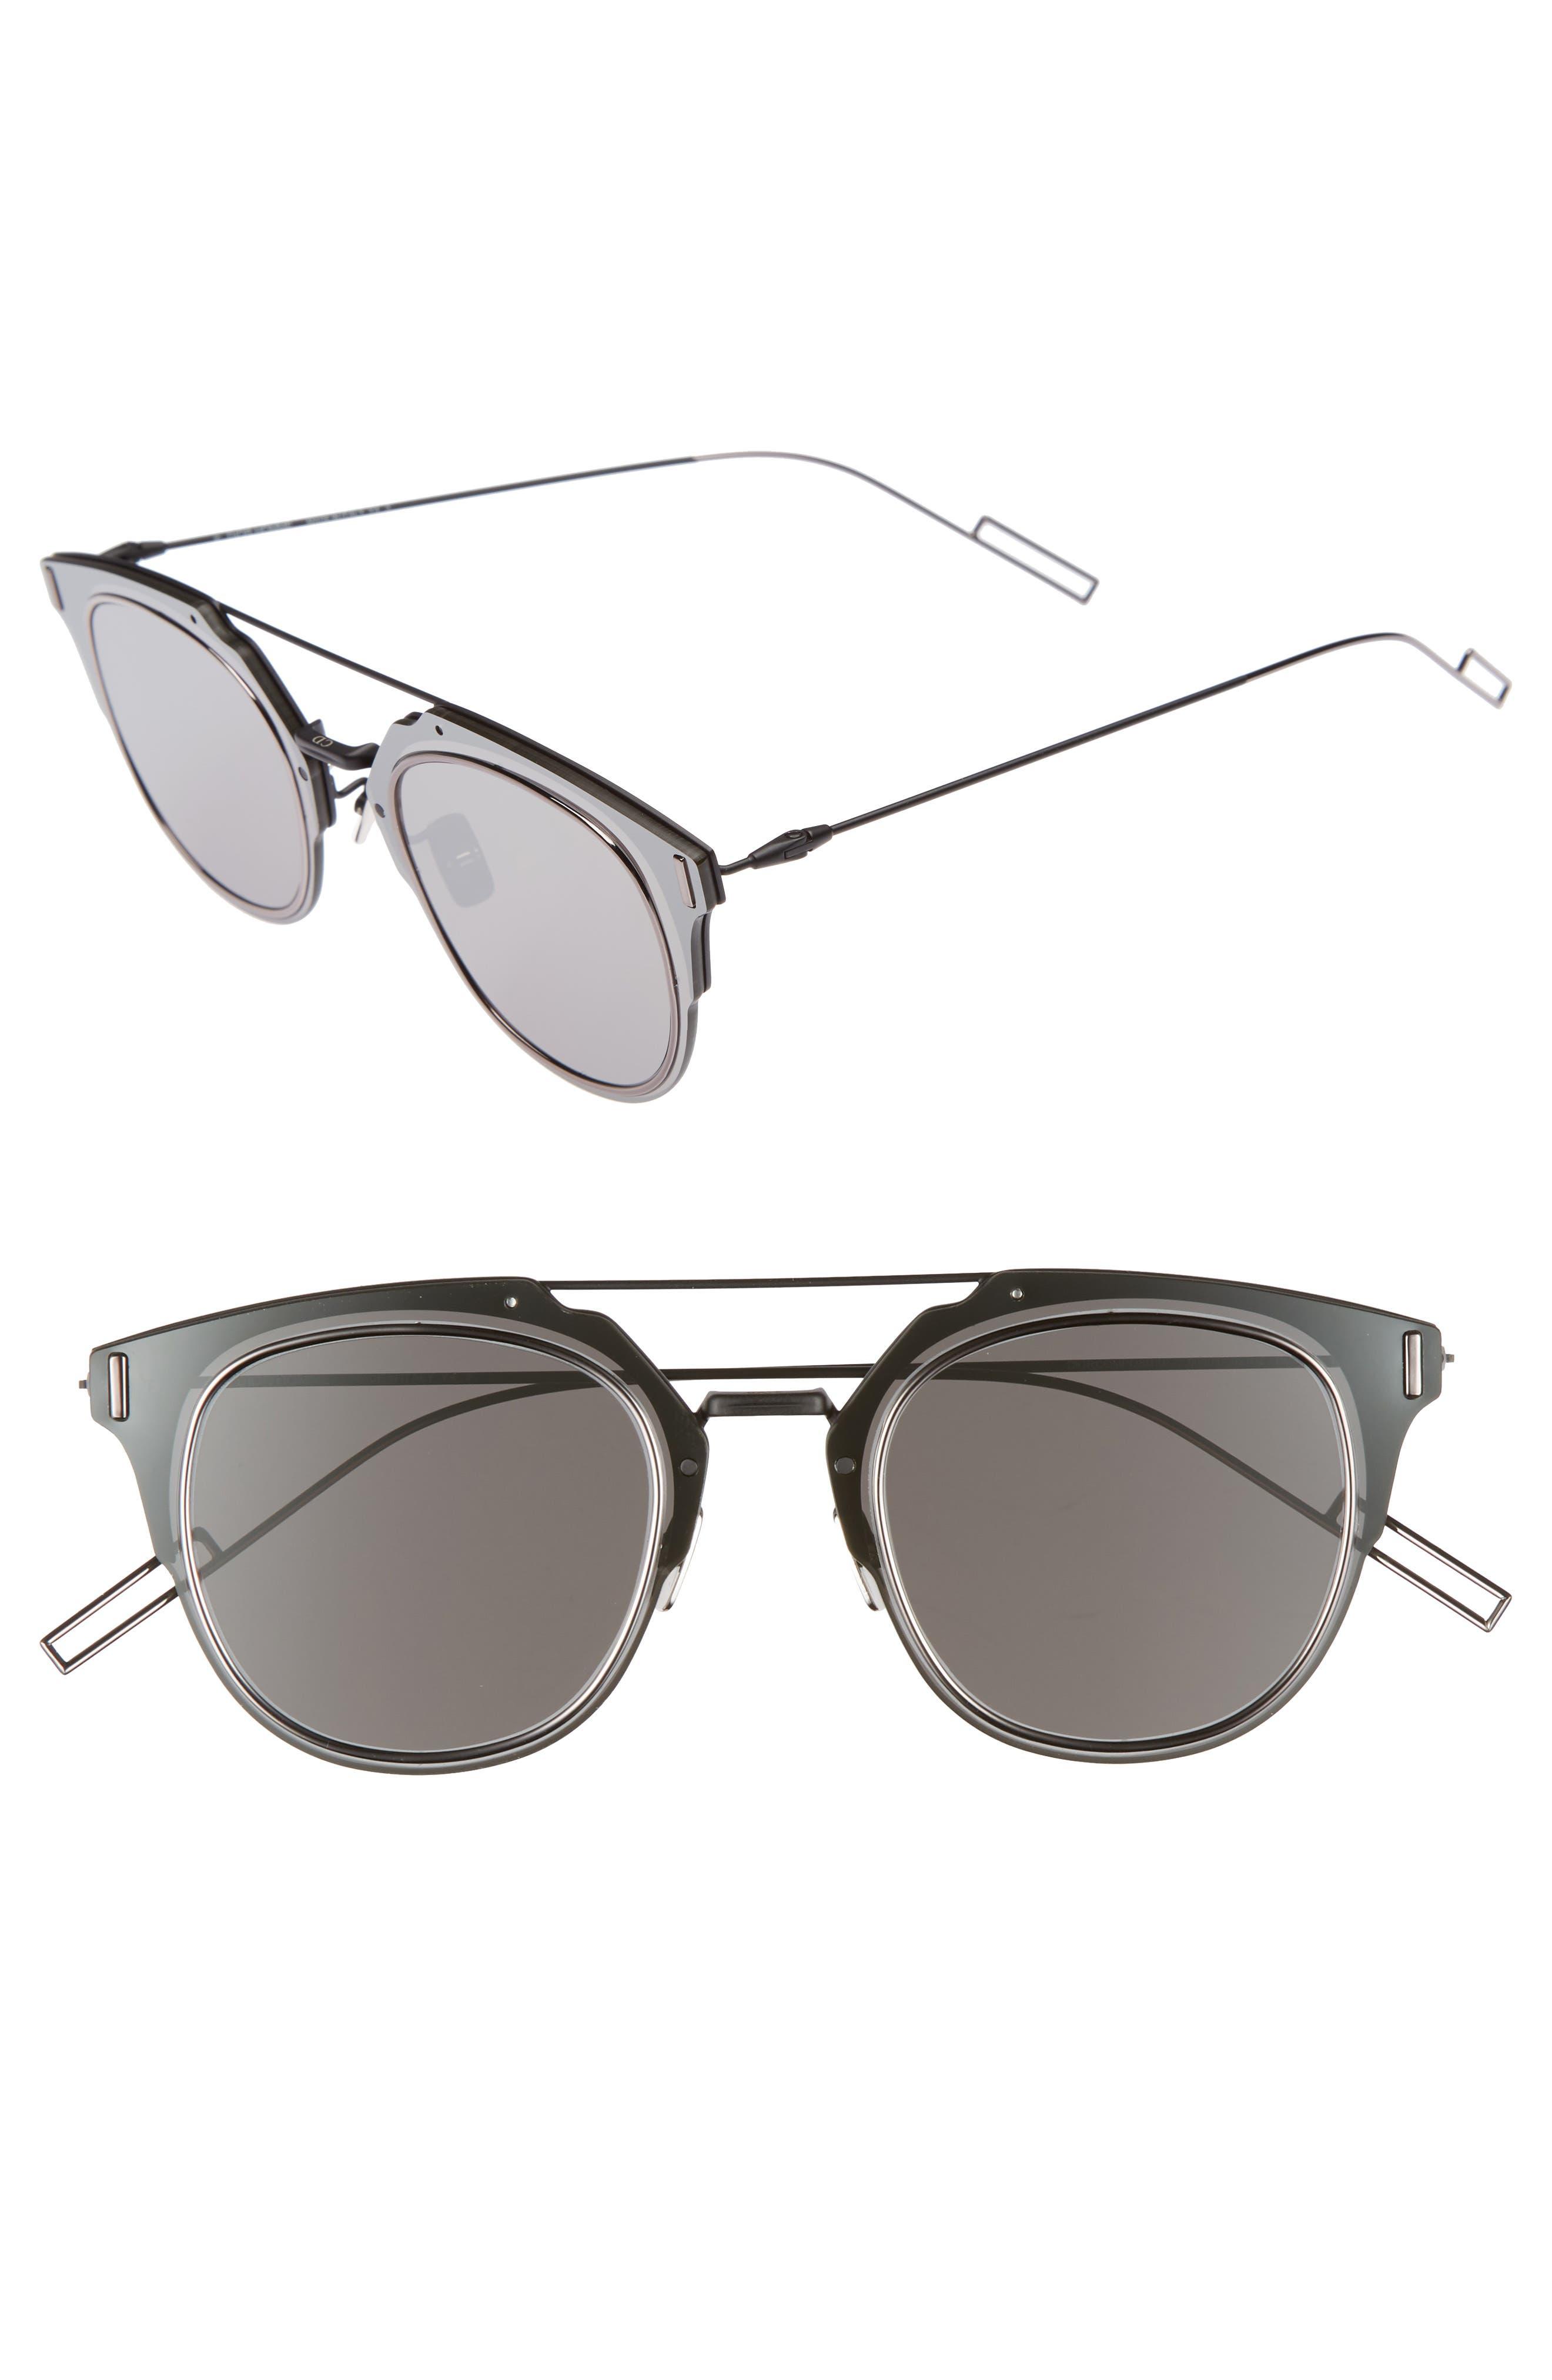 Main Image - Dior Homme 'Composit 1.0S' 62mm Metal Shield Sunglasses